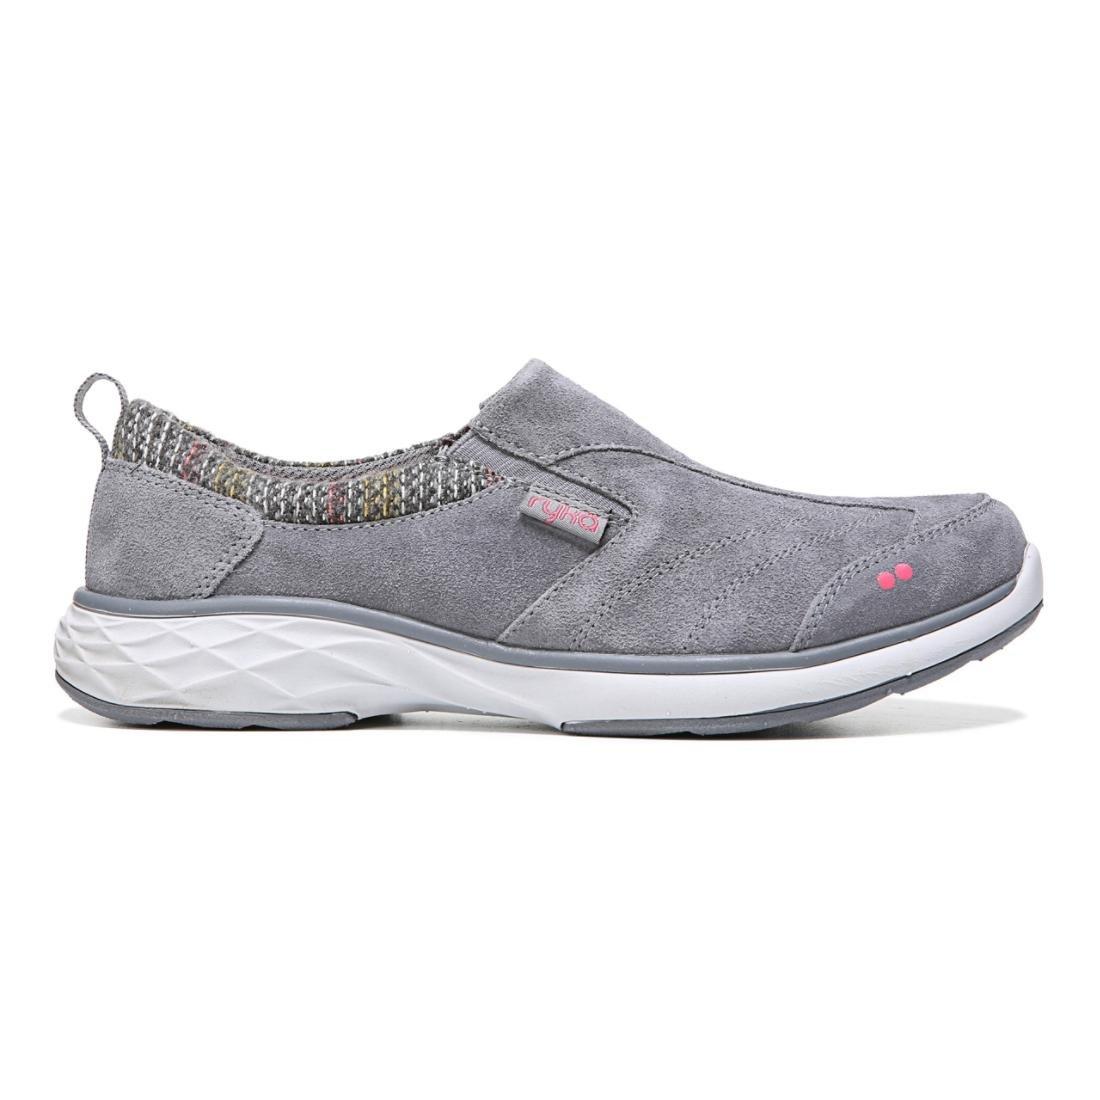 Ryka Women's Terrain Sneaker B01NB10HFD 5 B(M) US|Grey/Coral